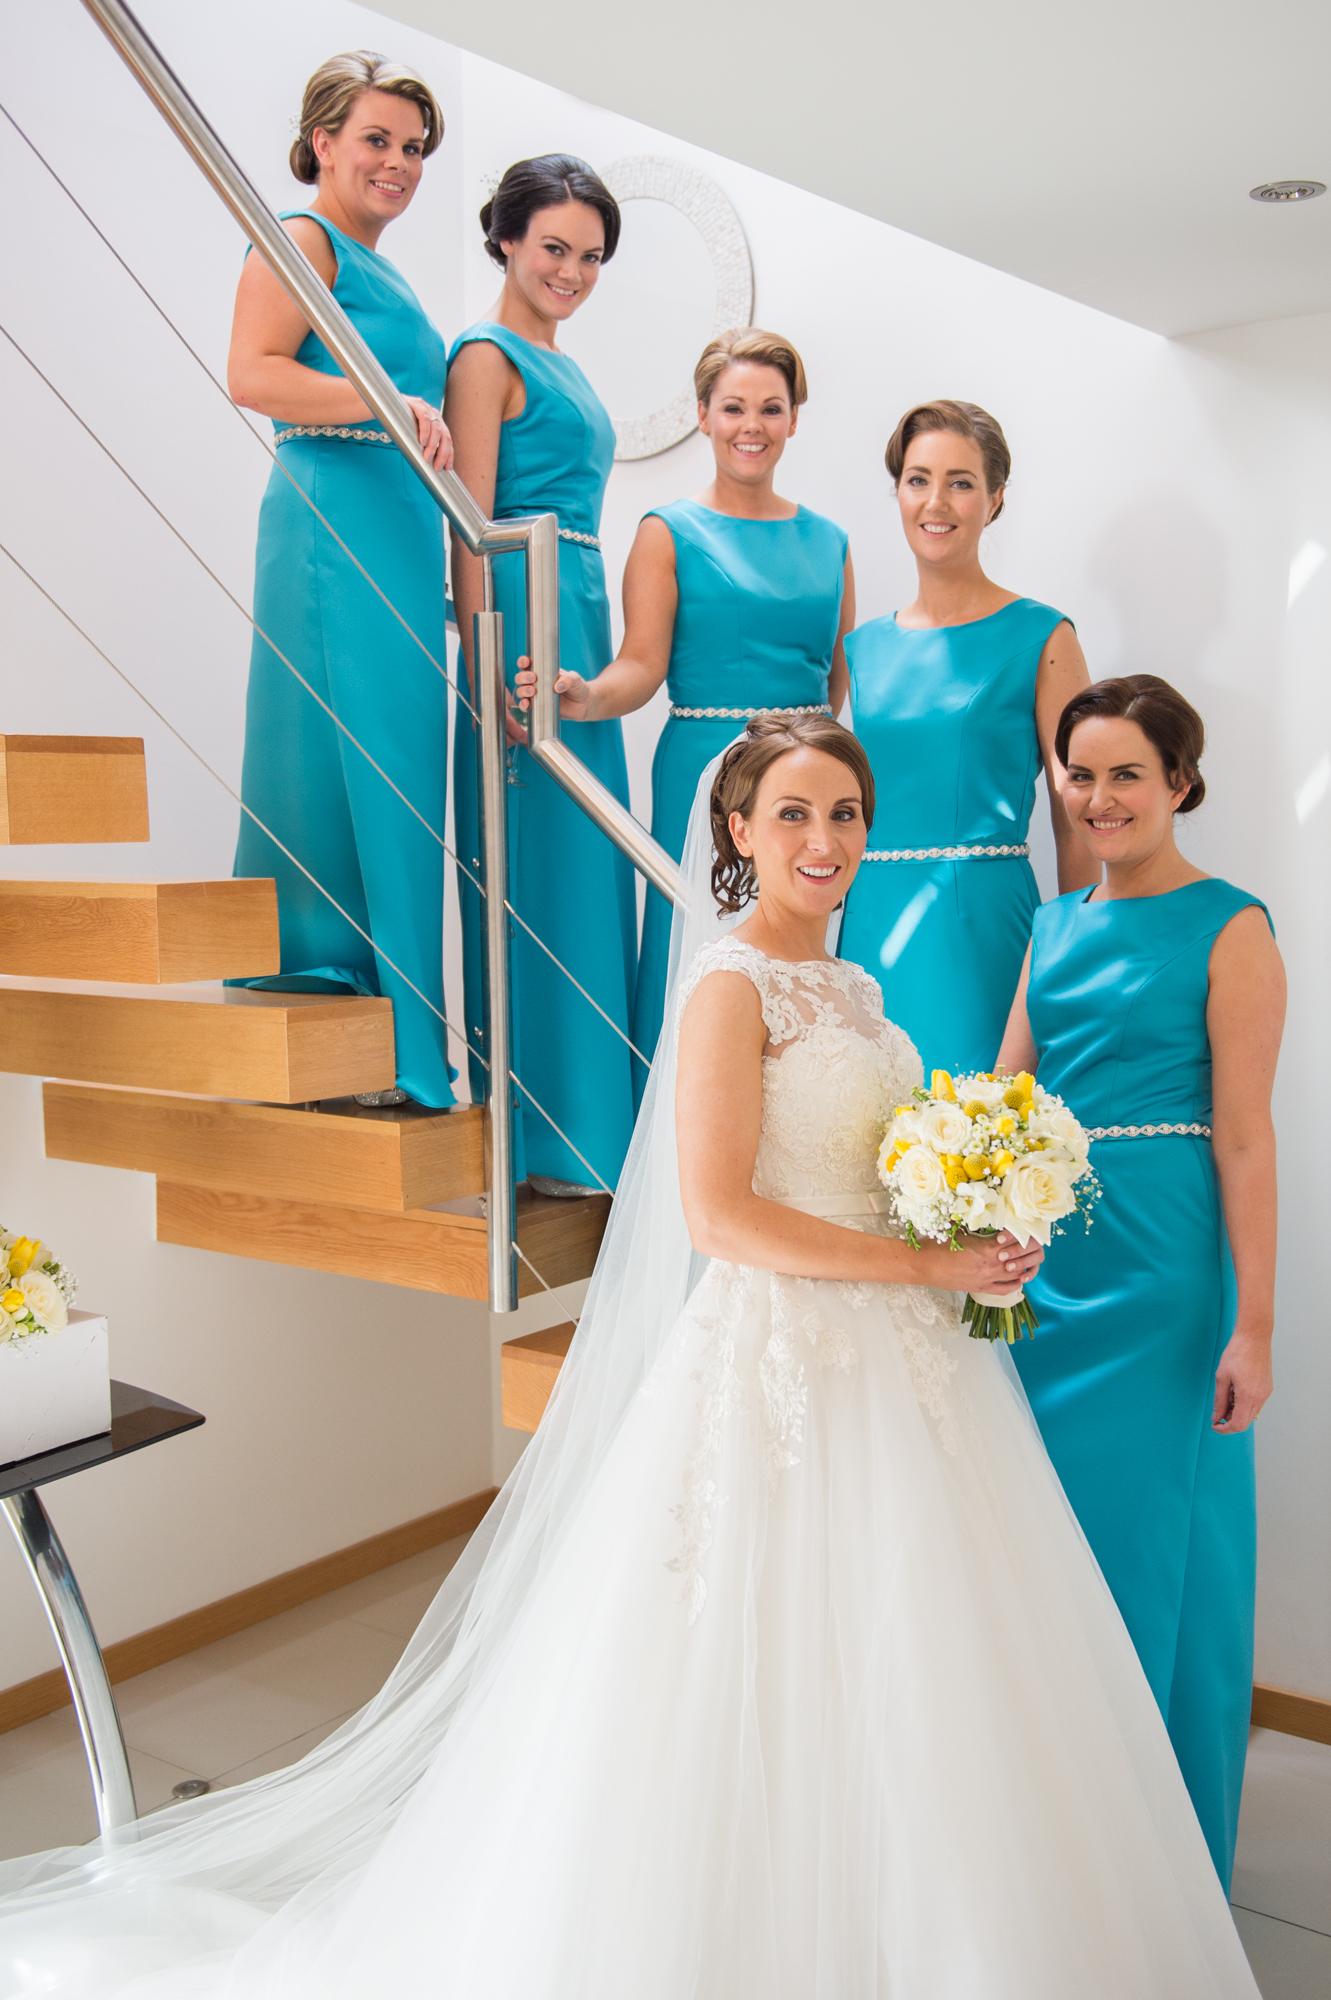 Michael_Gill_Photography_Wedding_Greencastle_Lousie_Jason_Donegal-7.jpg